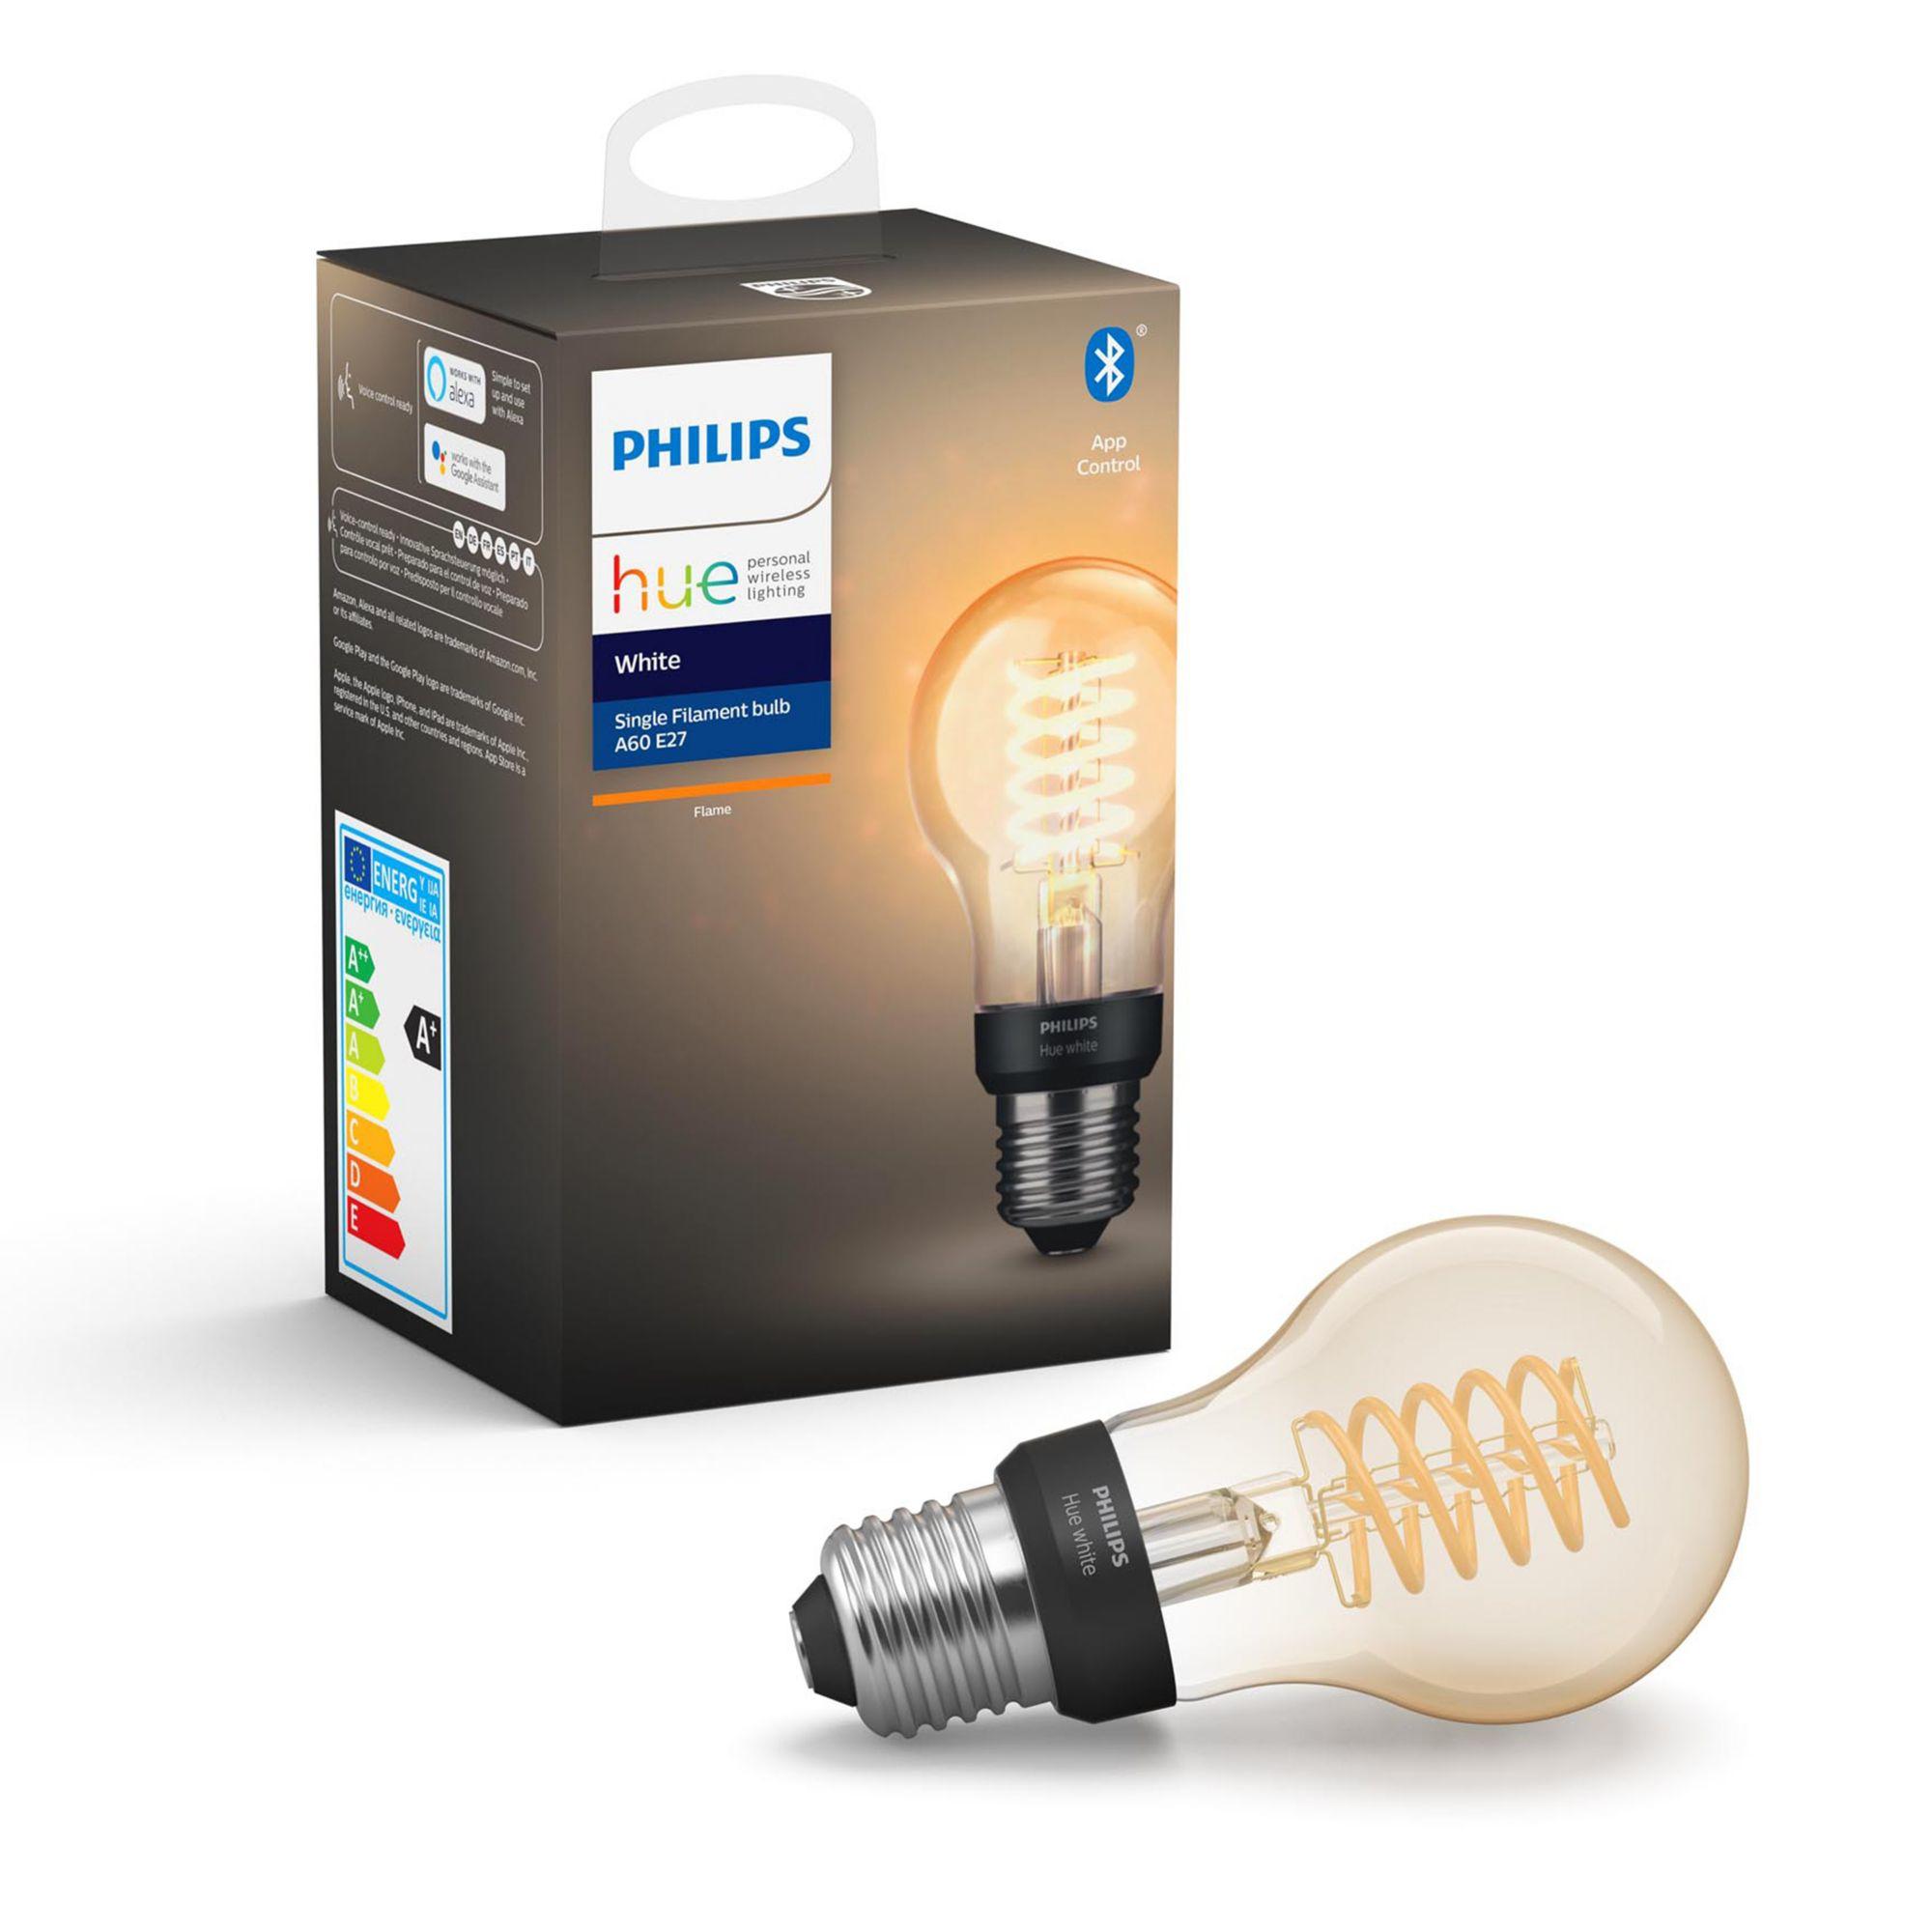 Philips HUE - 68882000